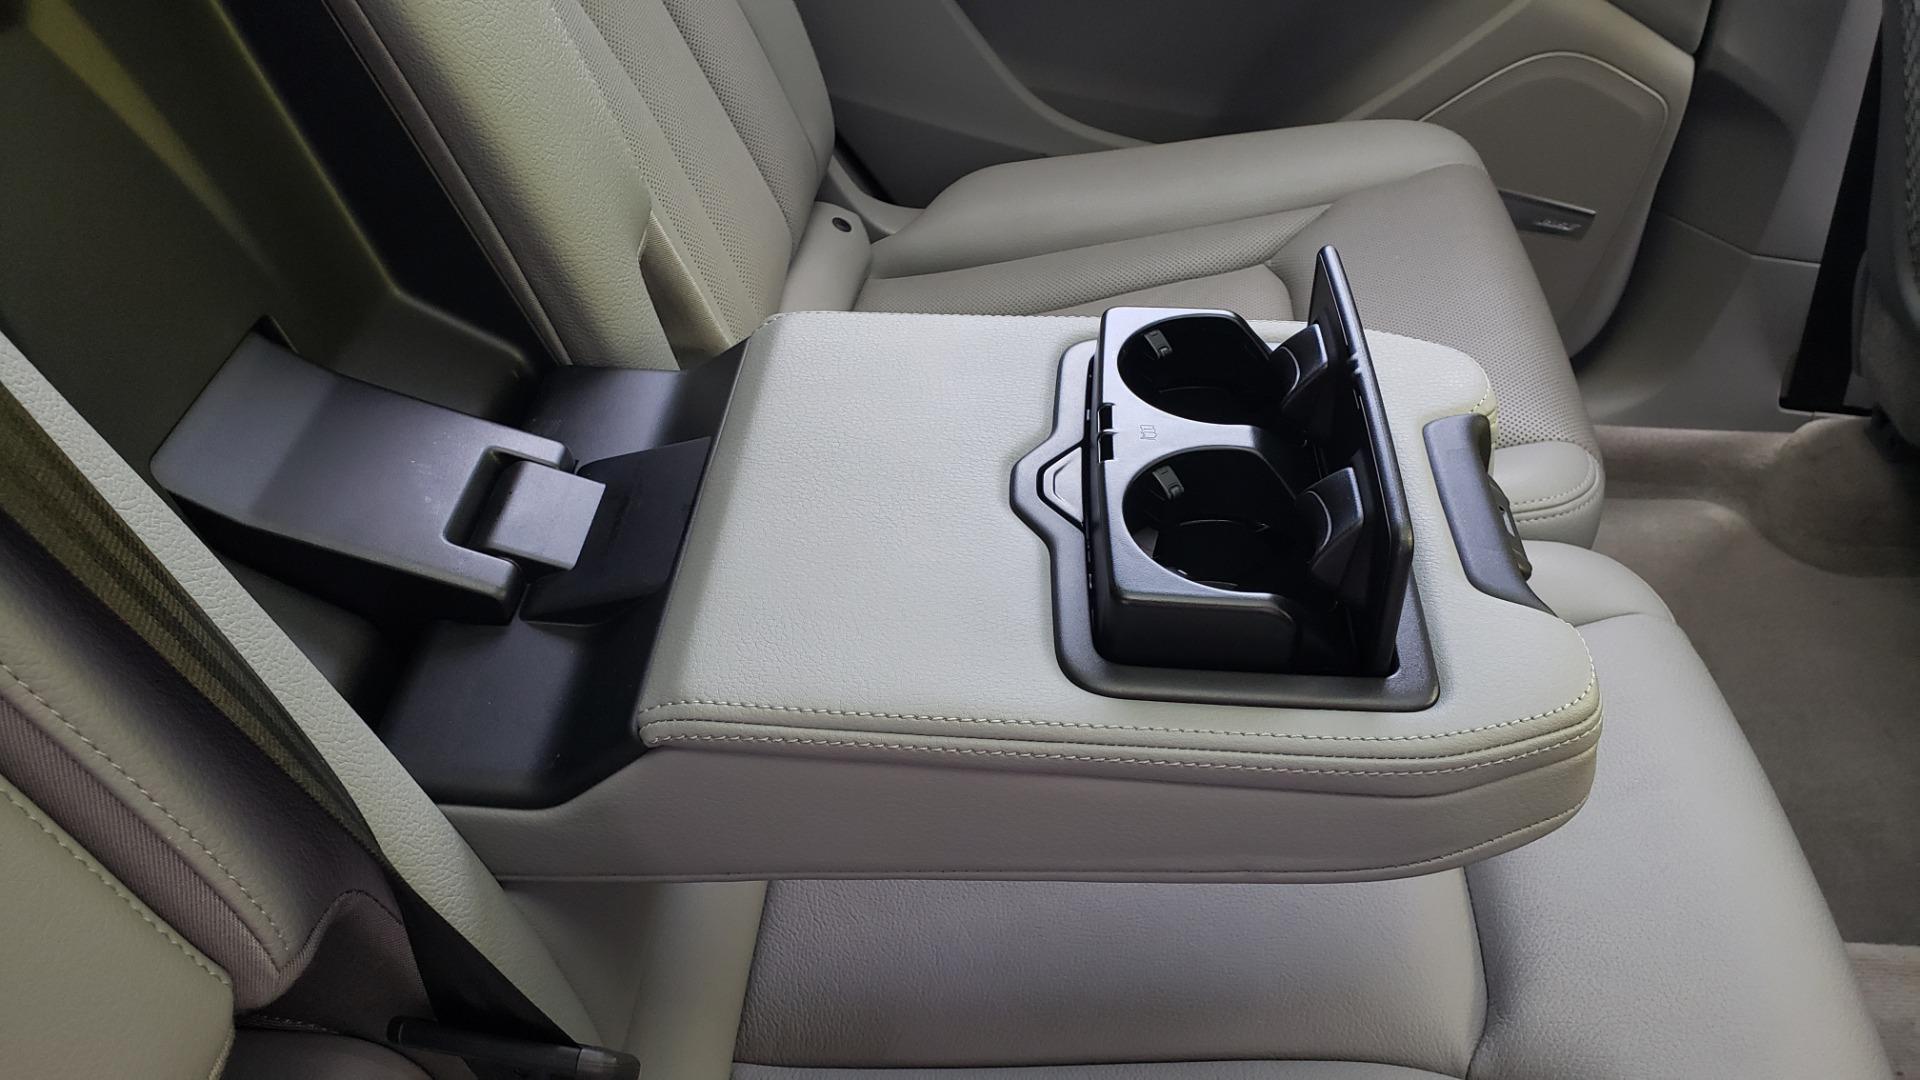 Used 2018 Audi Q7 PRESTIGE TIPTRONIC / NAV / SUNROOF / ADAPTIVE PKG / DRVR ASST / CLD WTHR /  for sale $49,995 at Formula Imports in Charlotte NC 28227 79